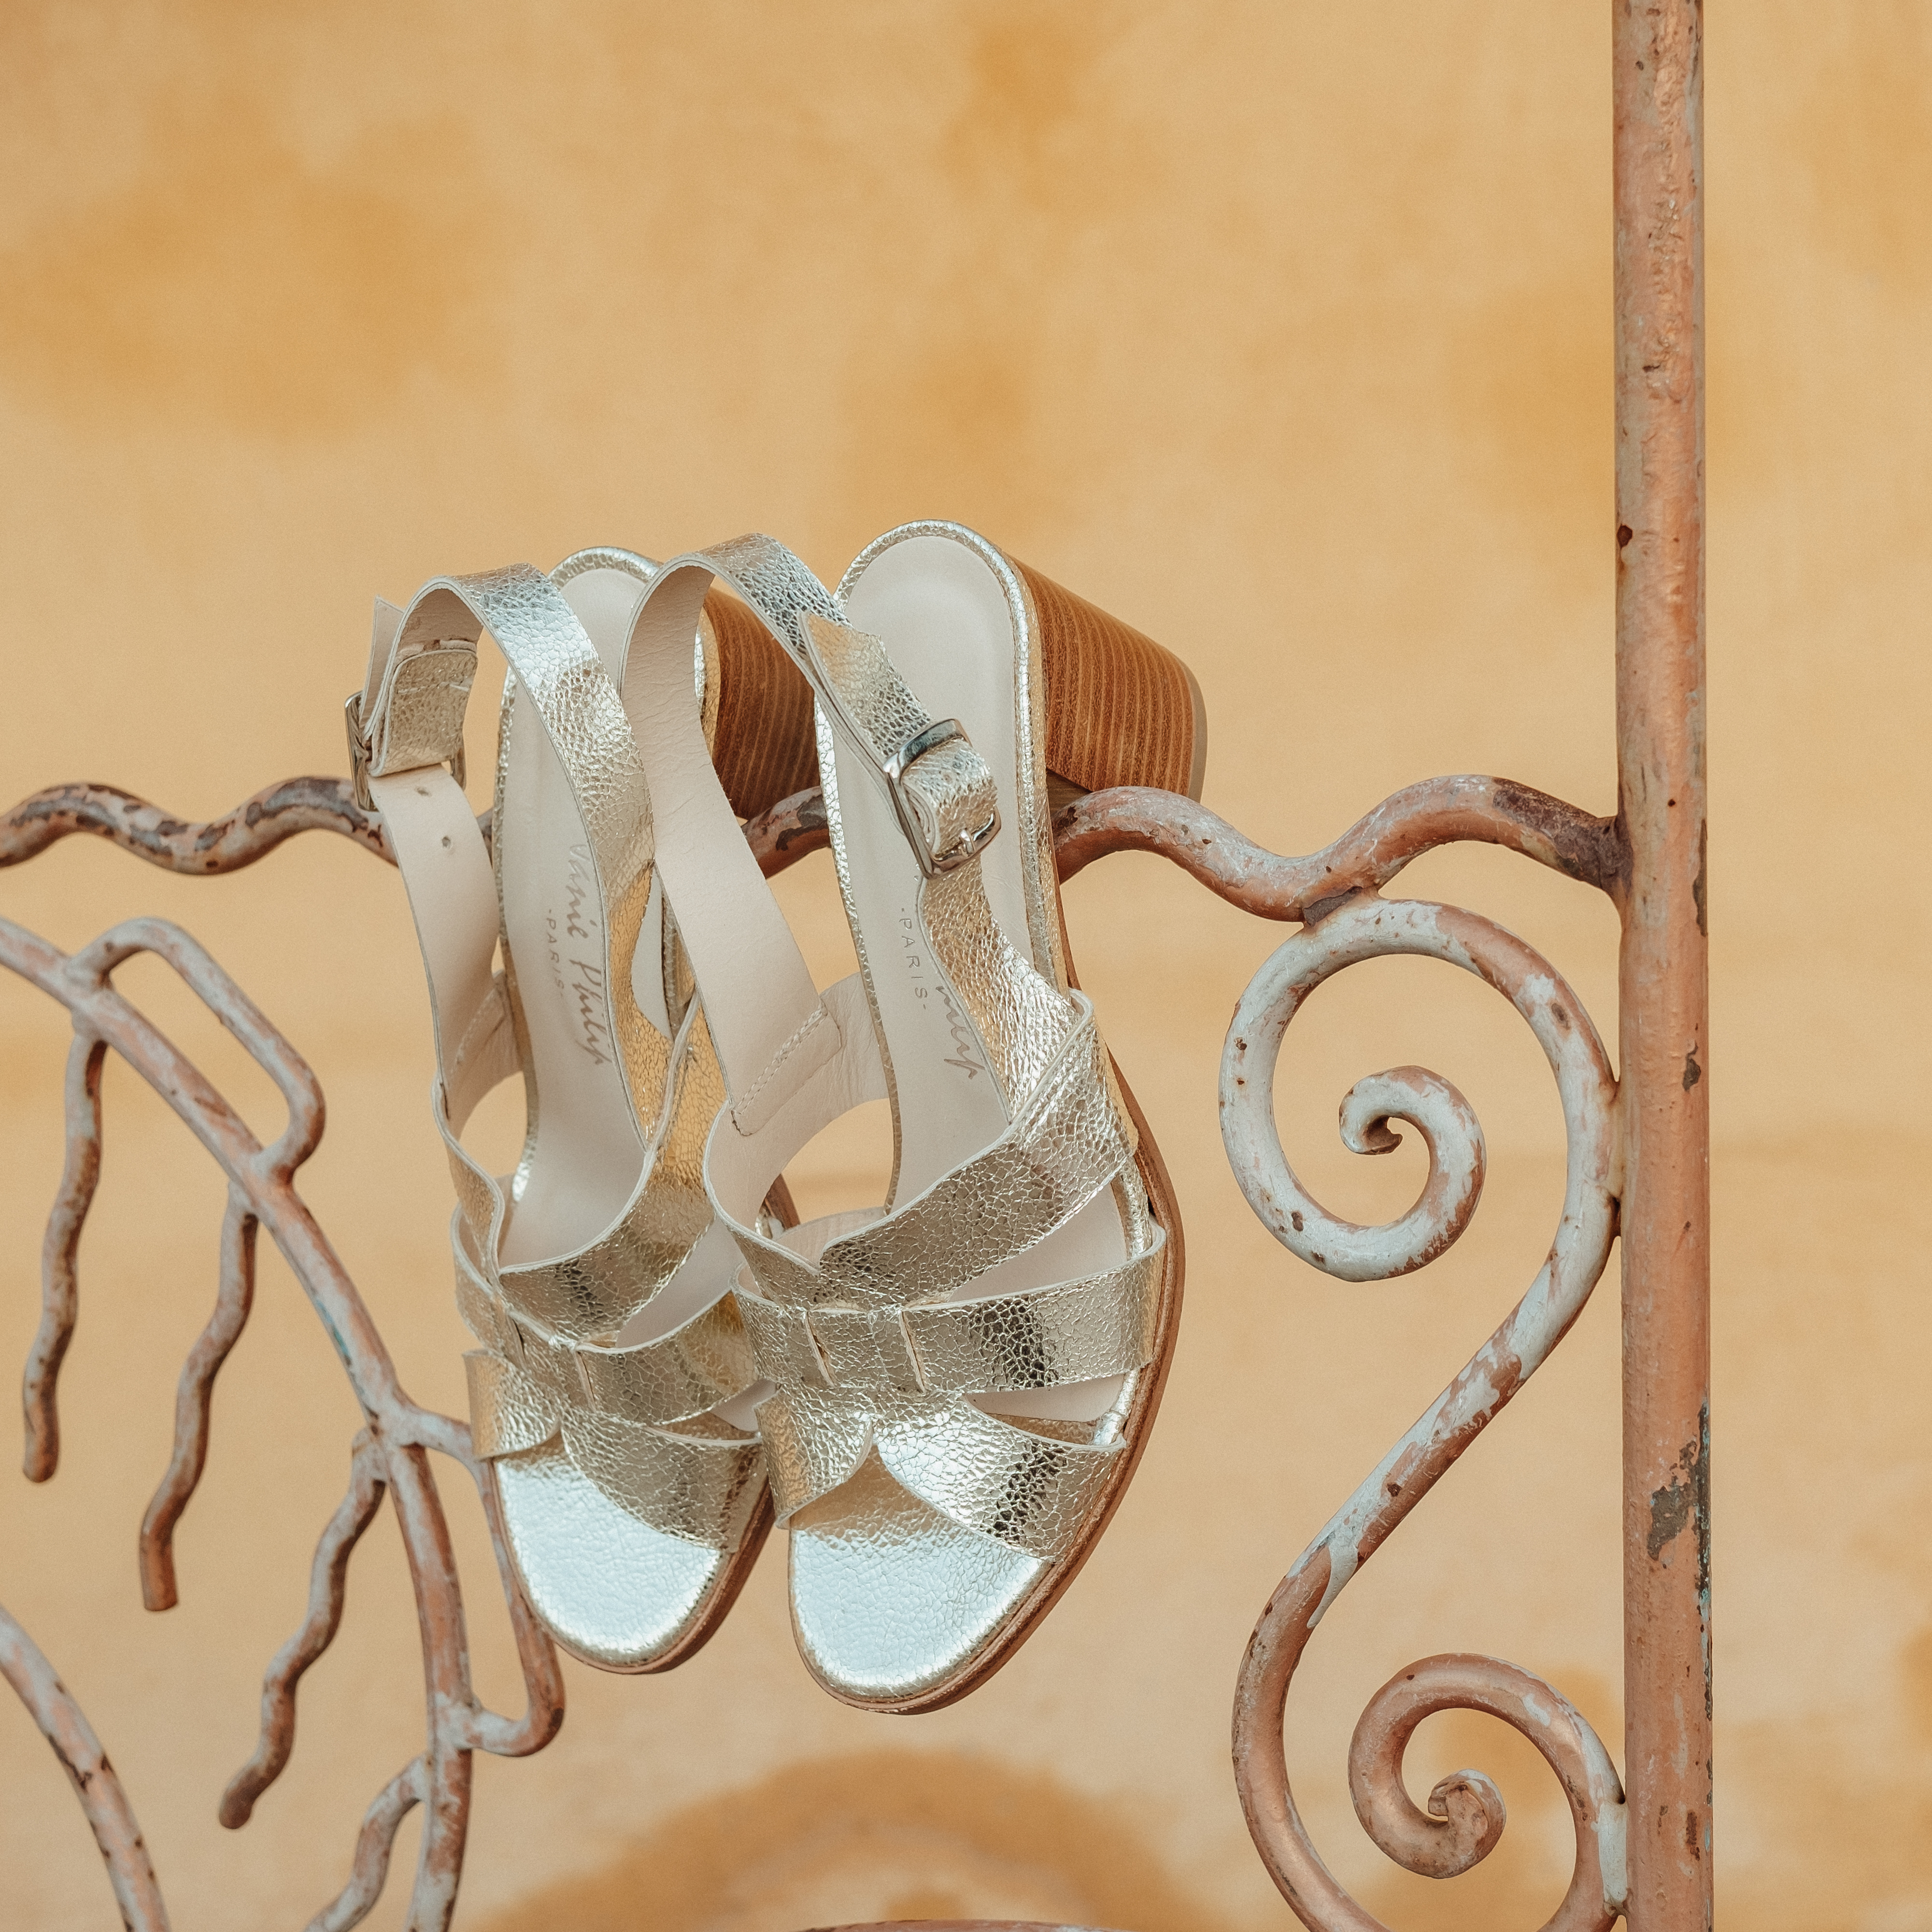 JEF Chaussures Boulogne-Sur-Mer